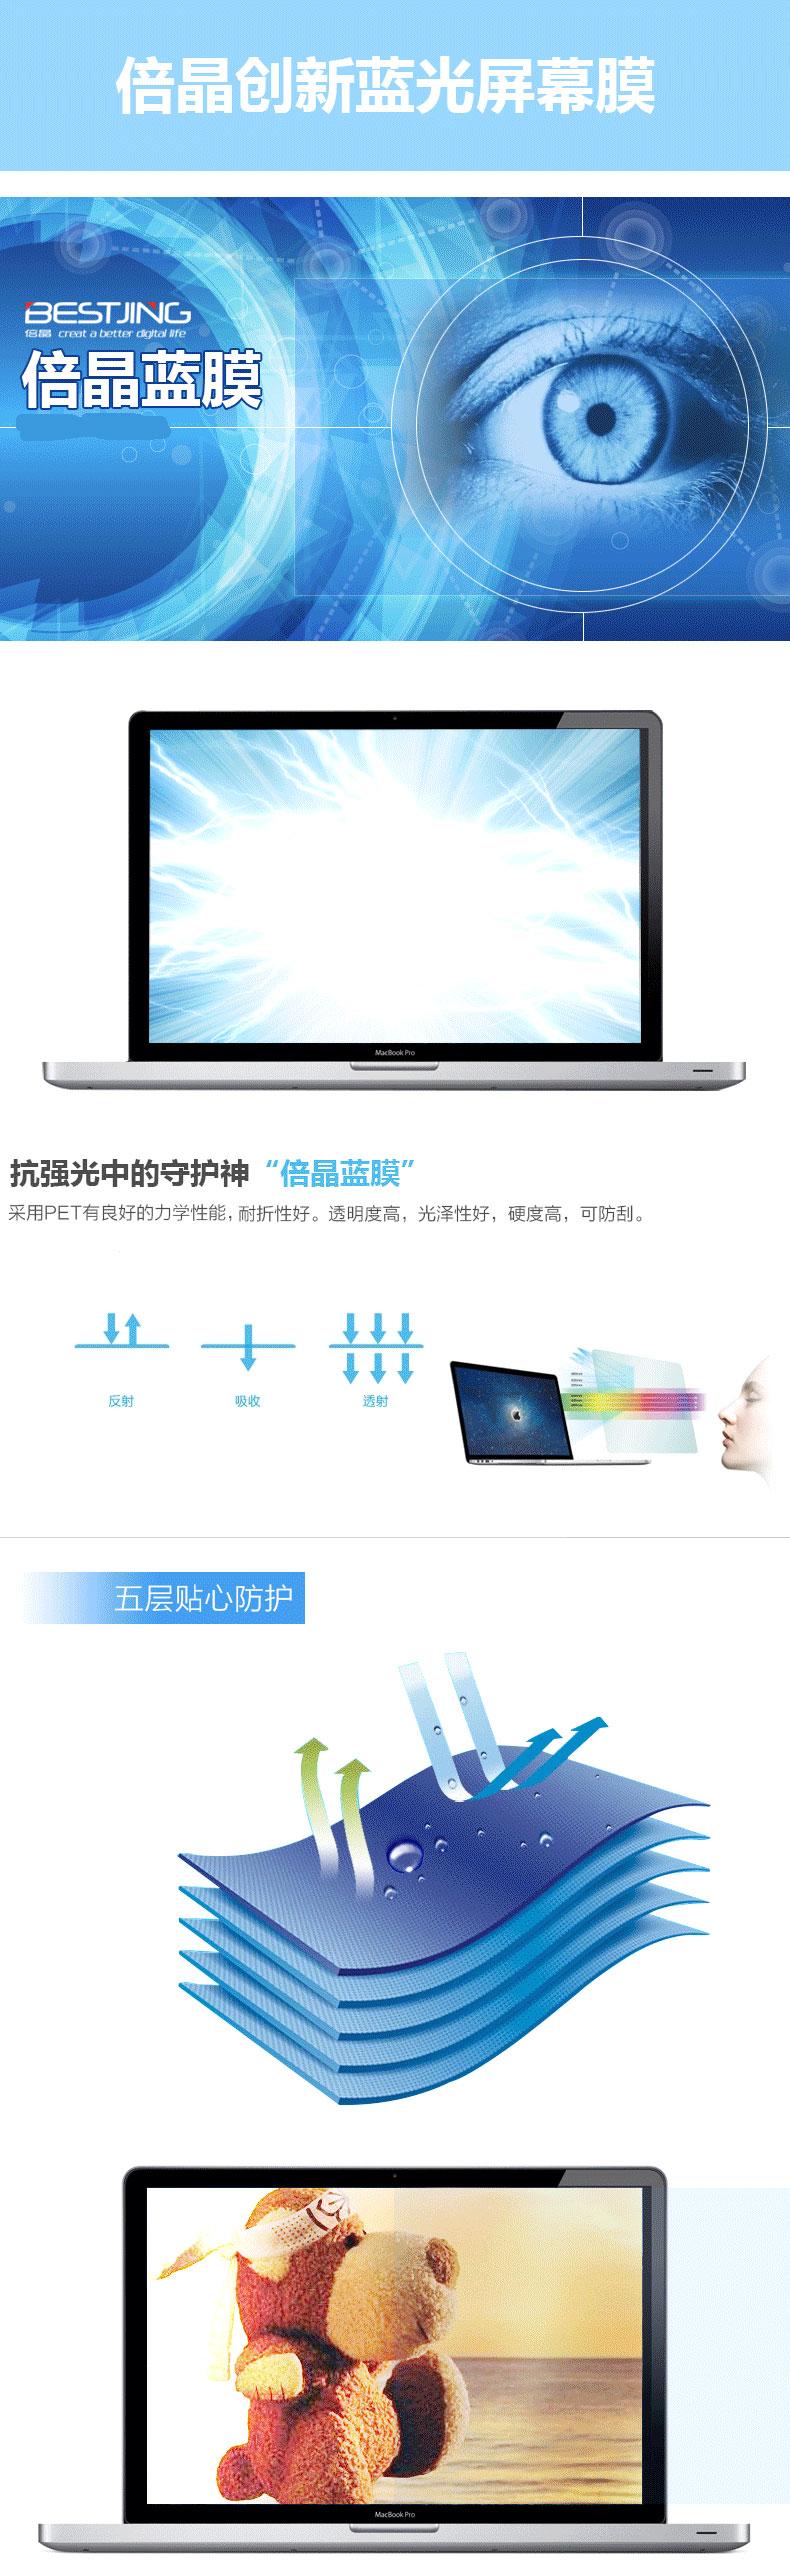 Dán Macbook  macbookpro13air13312mac15 Pro13BarA17061989 问 - ảnh 35